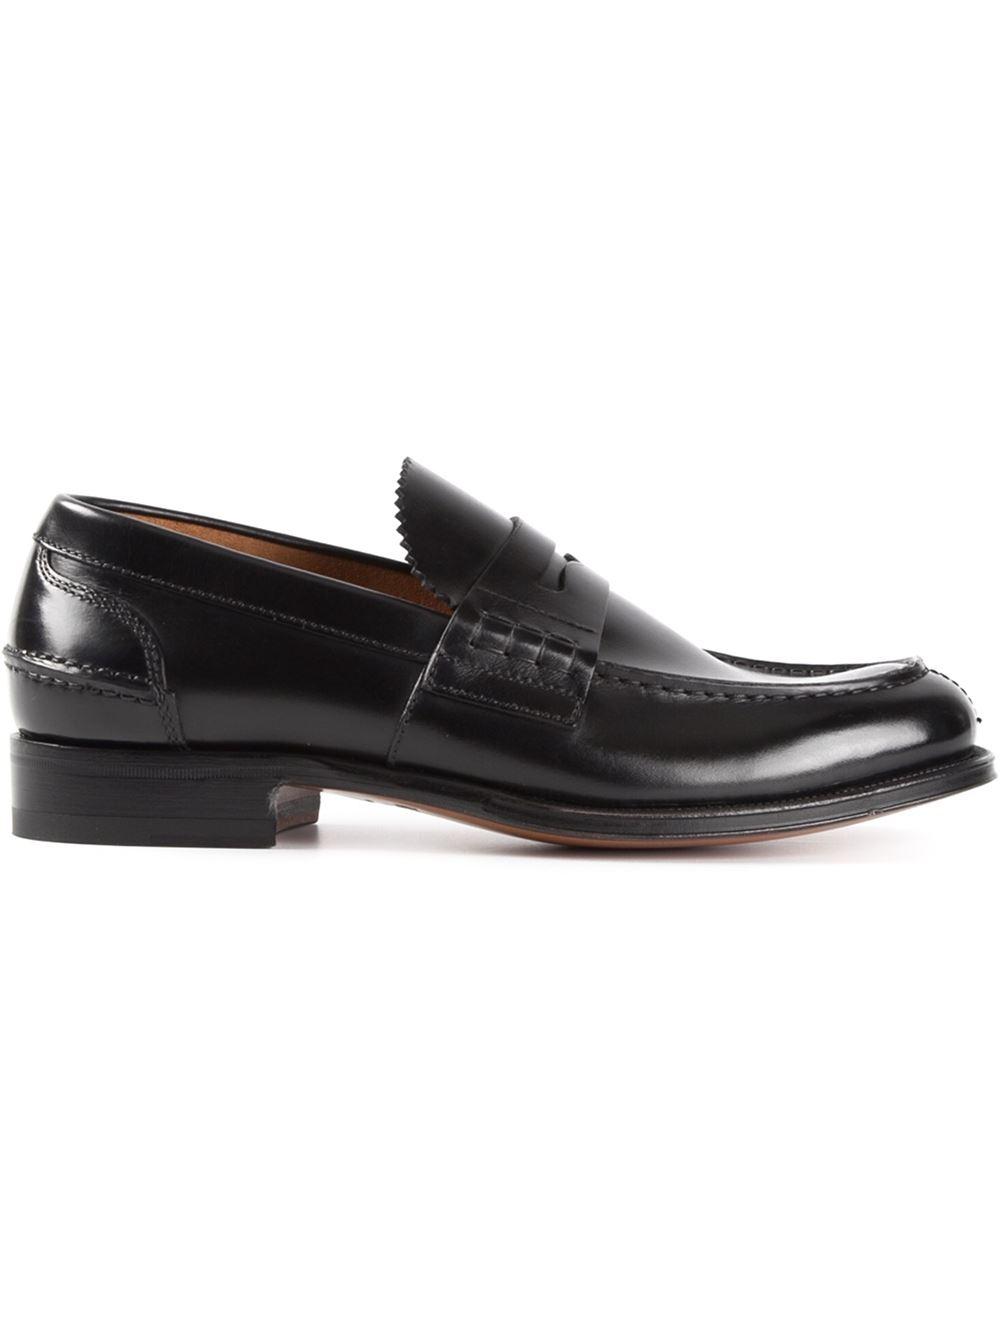 Timberland Classic Boat Shoe Black